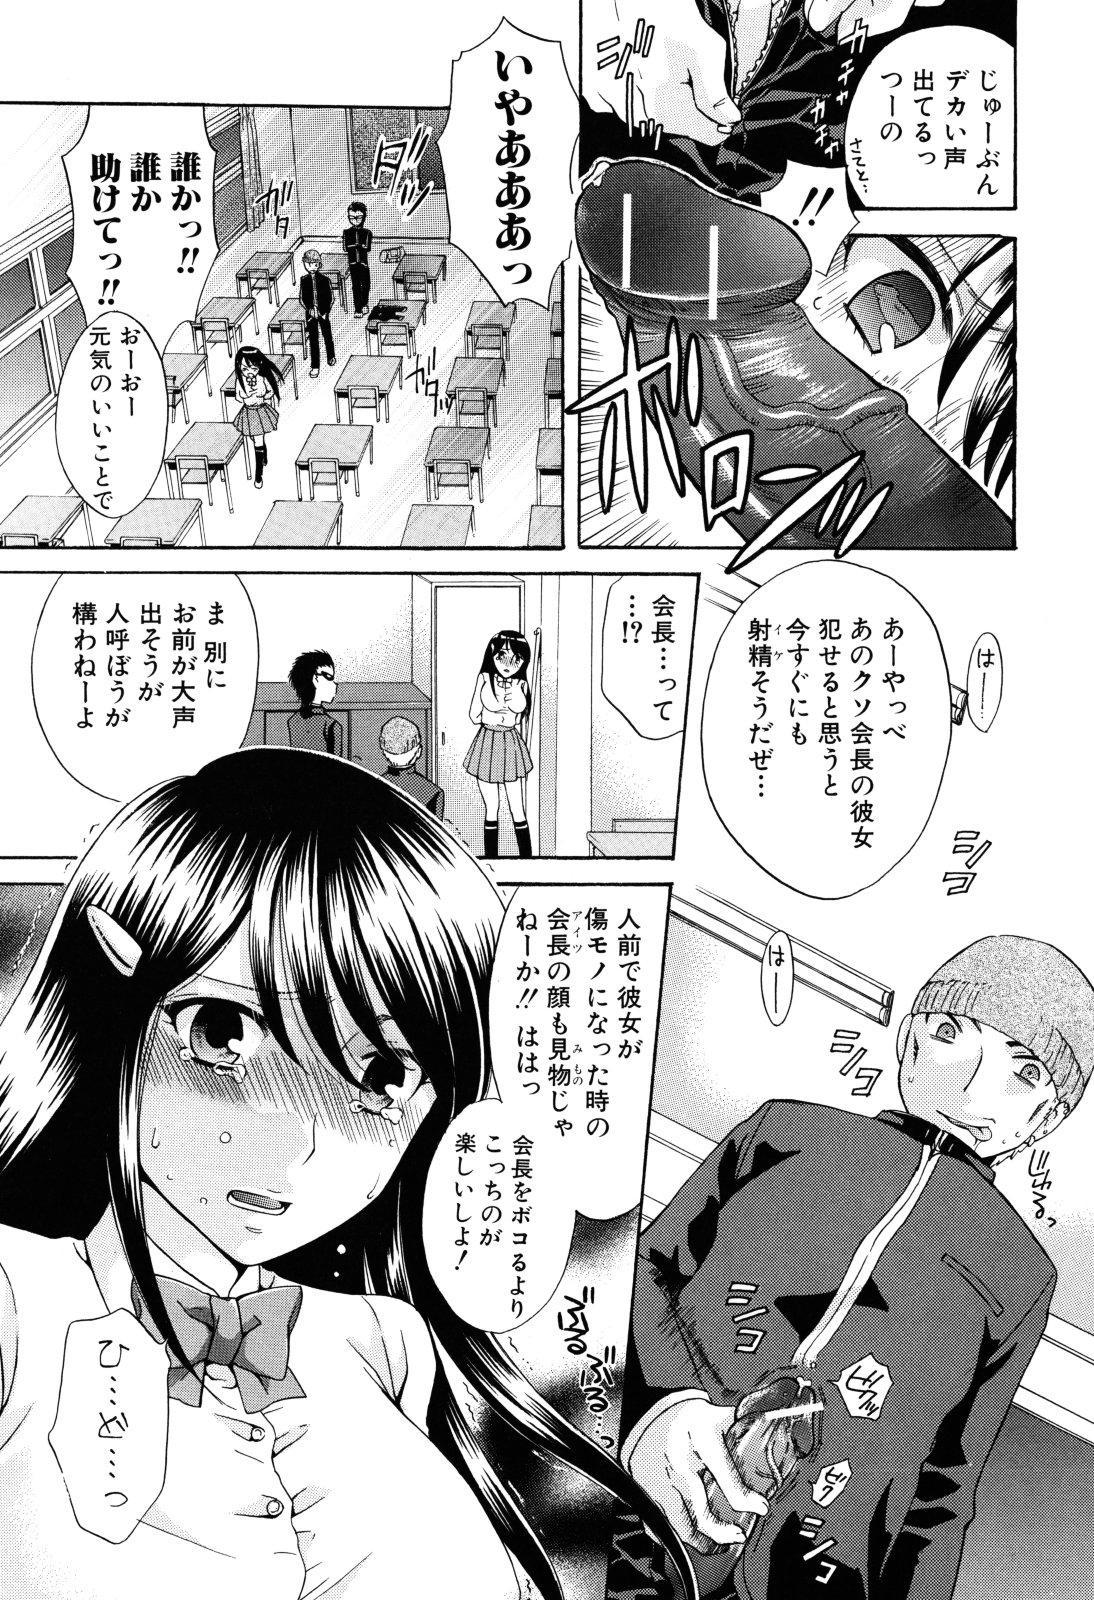 Kanojo ga Ochiru made - She in the depth 150